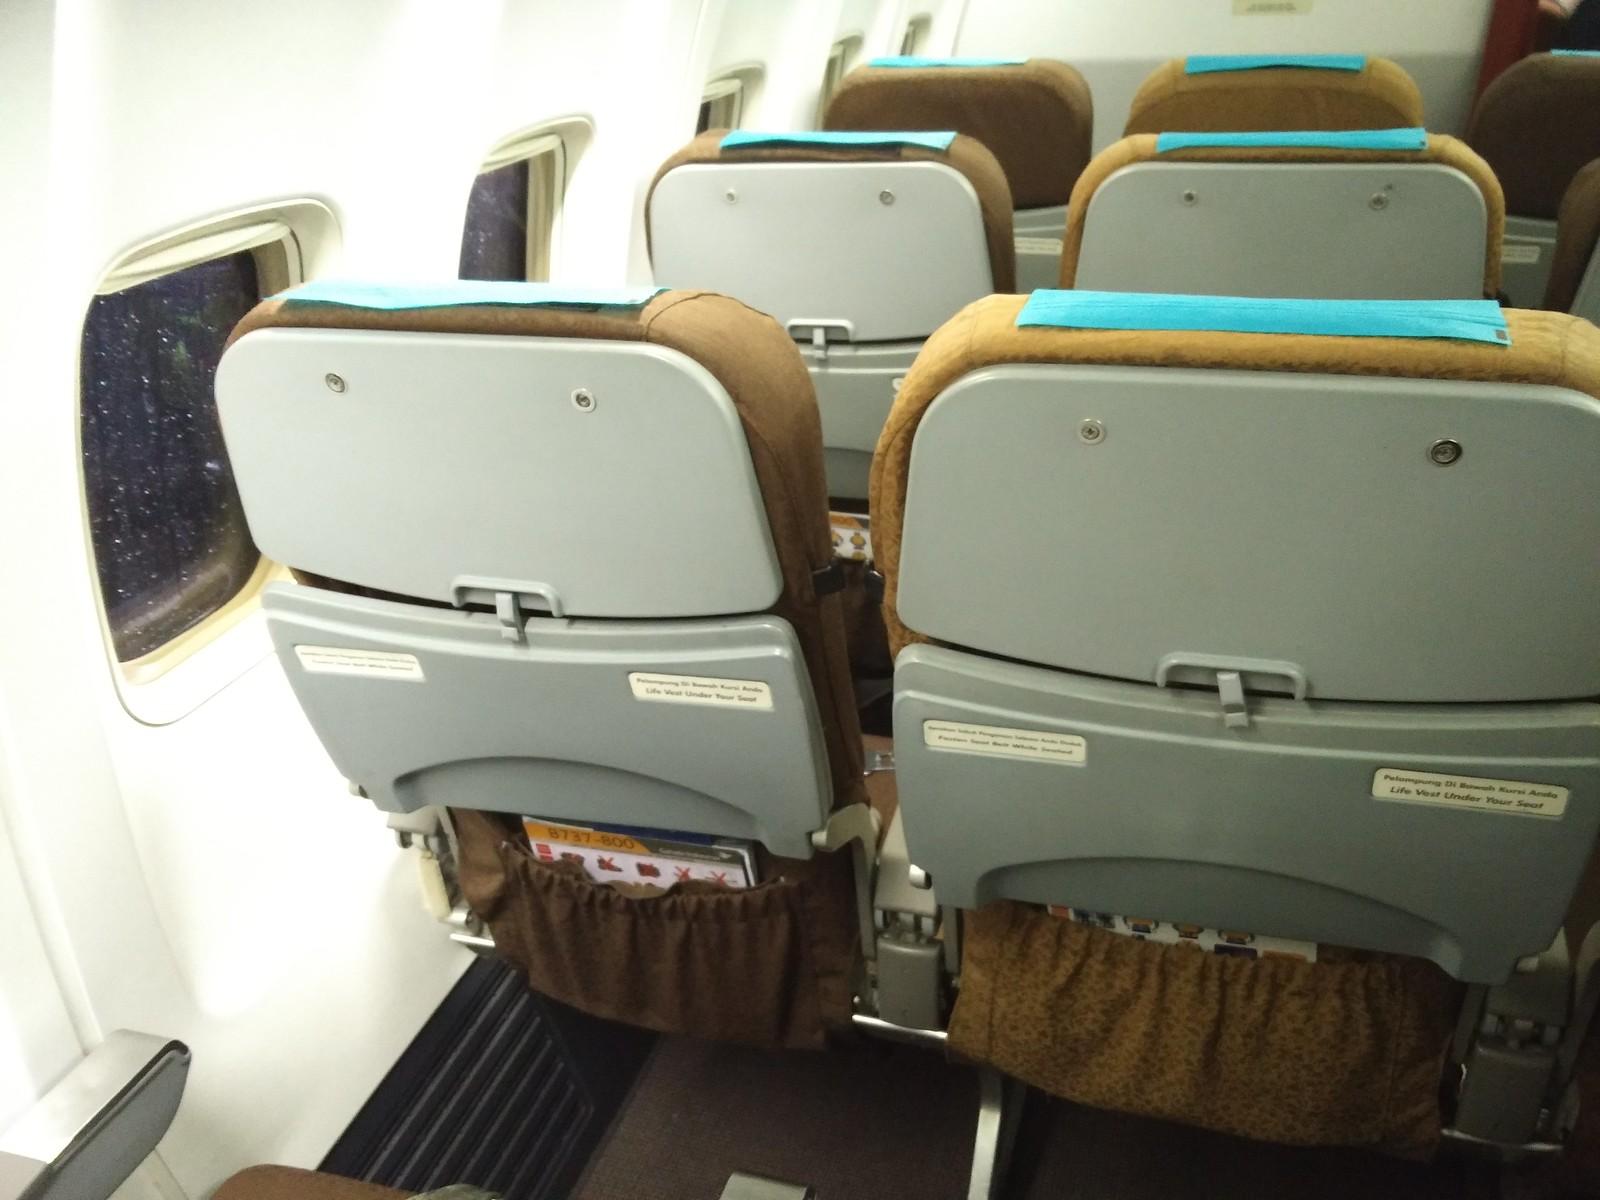 Old Economy Class seats